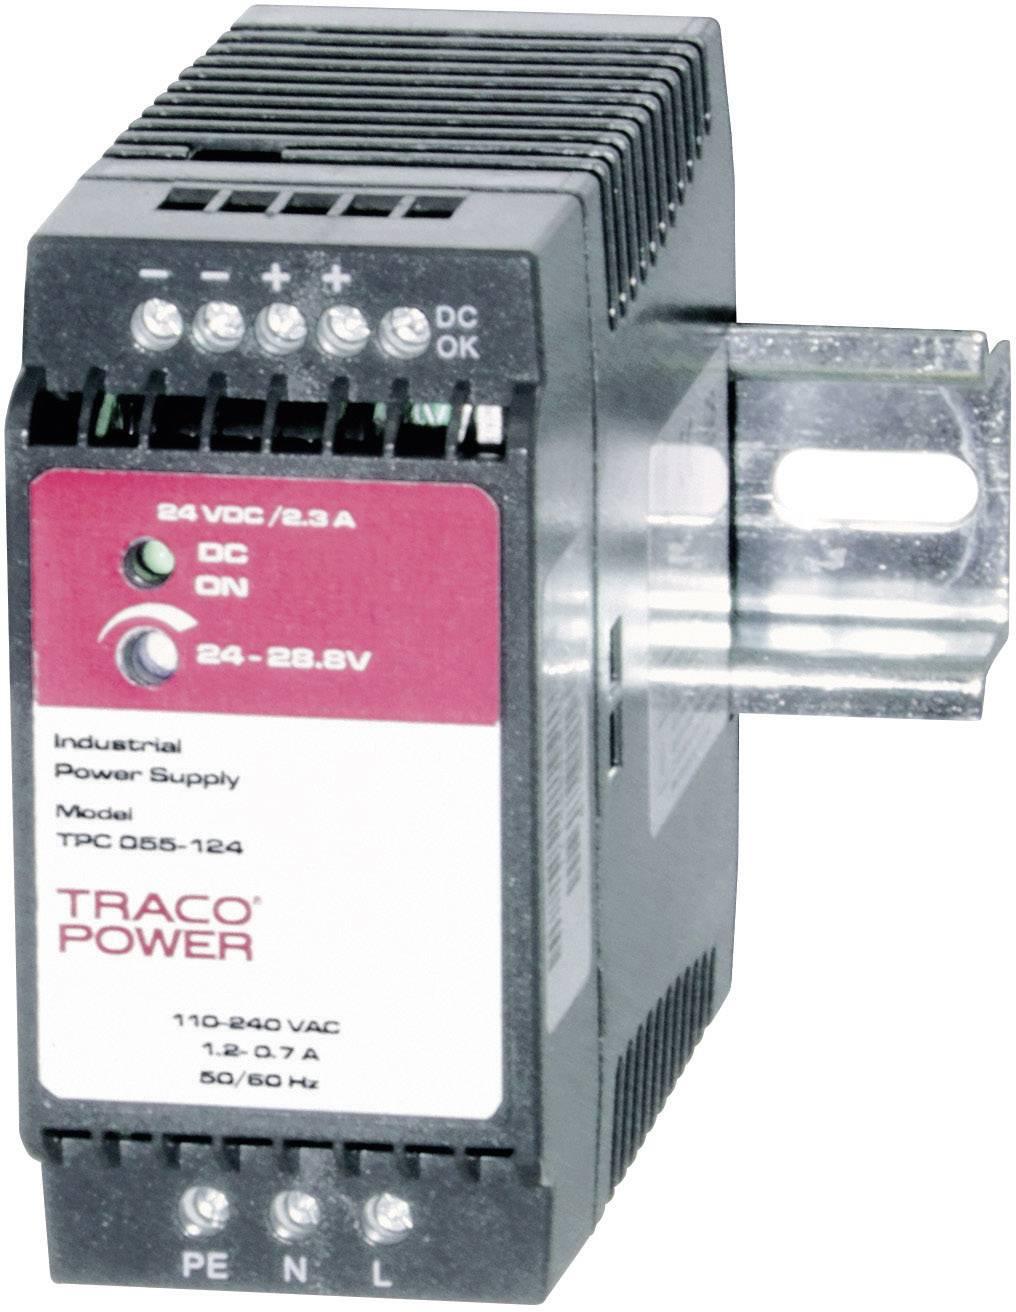 Zdroj na DIN lištu TracoPower TPC 055-112, 12 - 15 V/DC, 3,5 A